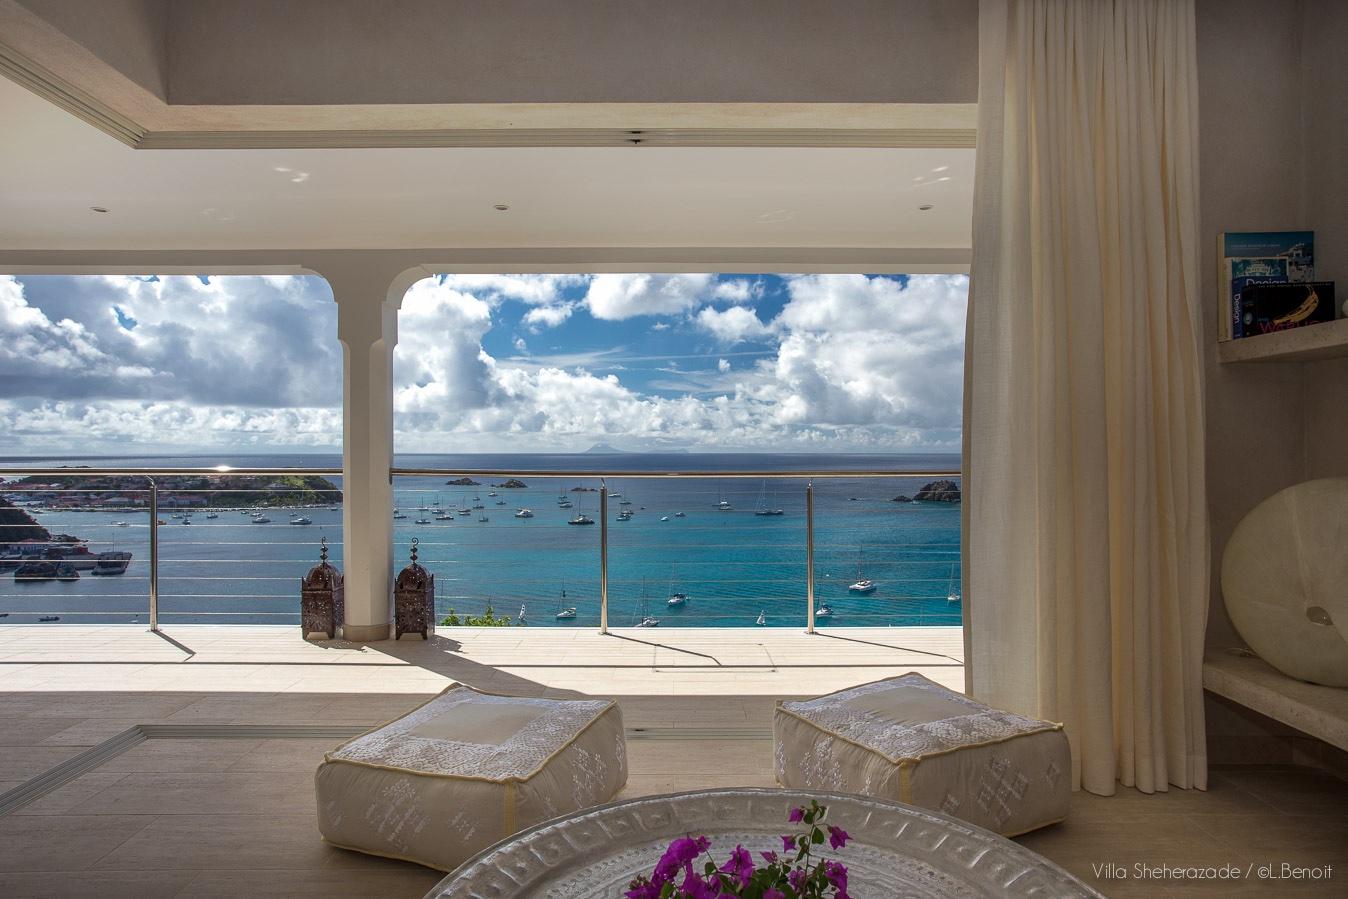 Villa Sheherazade - Morrocan Style Villa for Rent St Barth Perfect for Honeymoon - Seaview